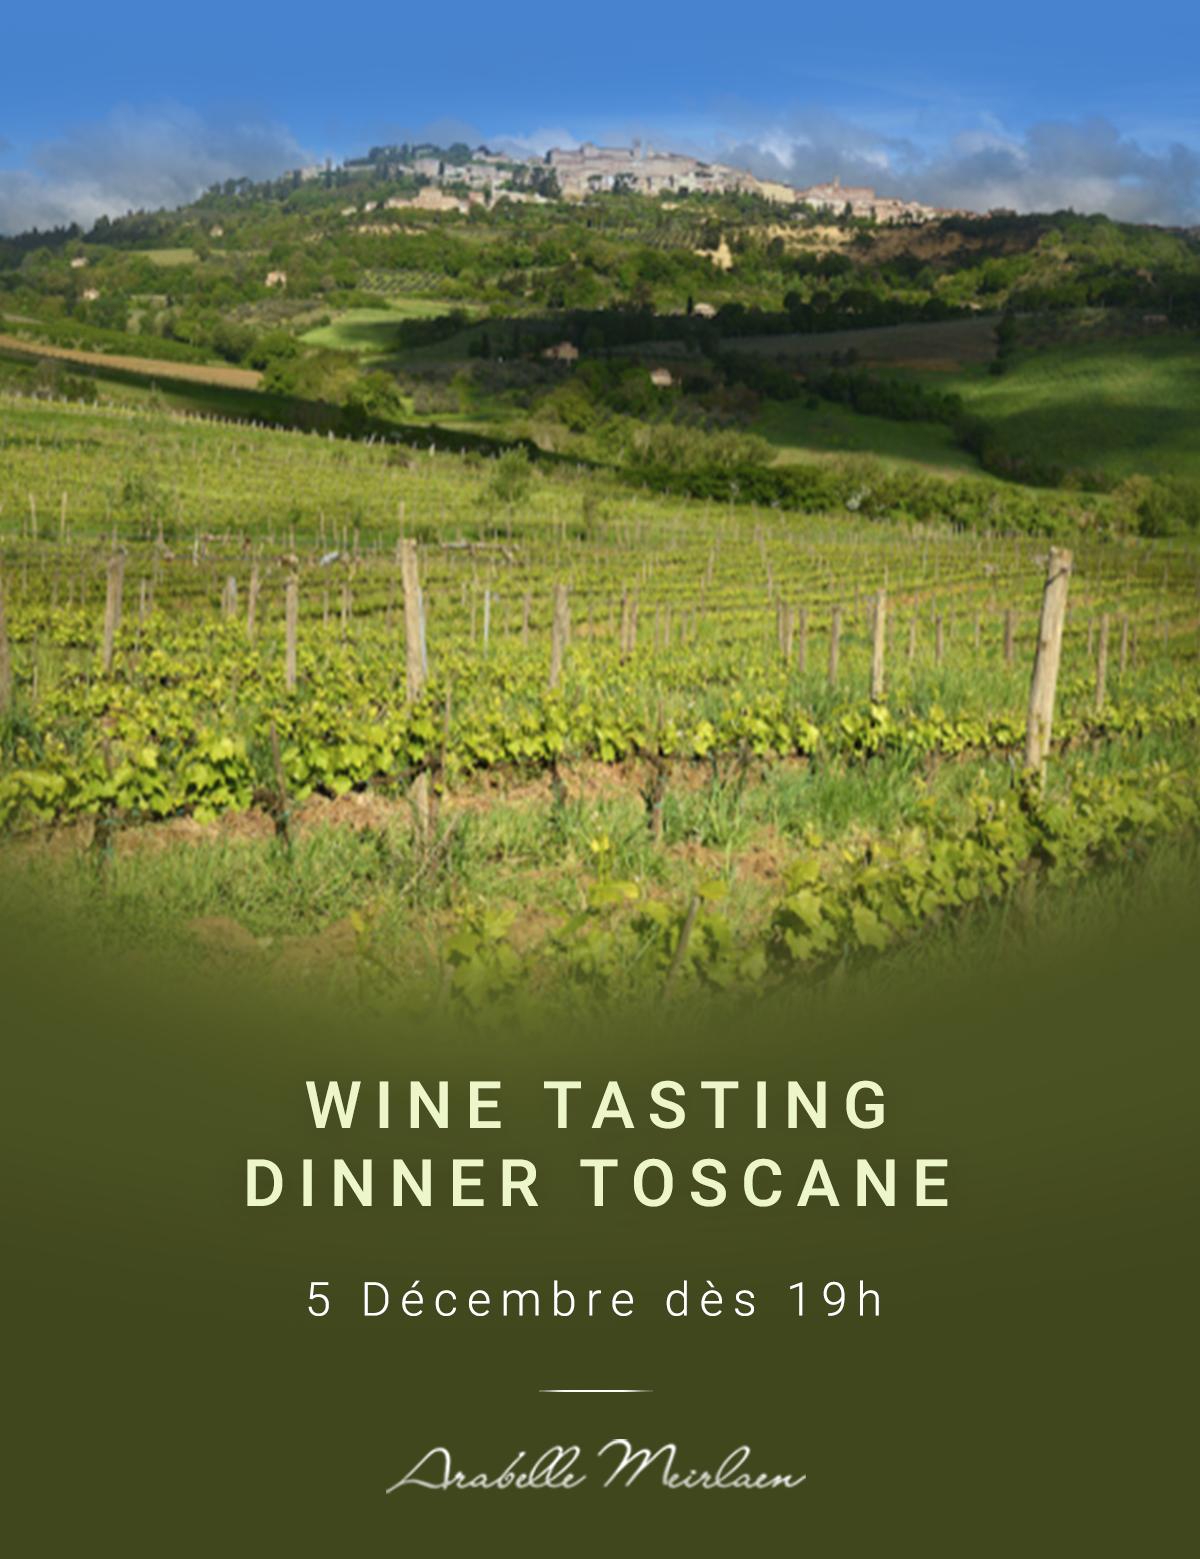 Wine Tasting Dinner toscane